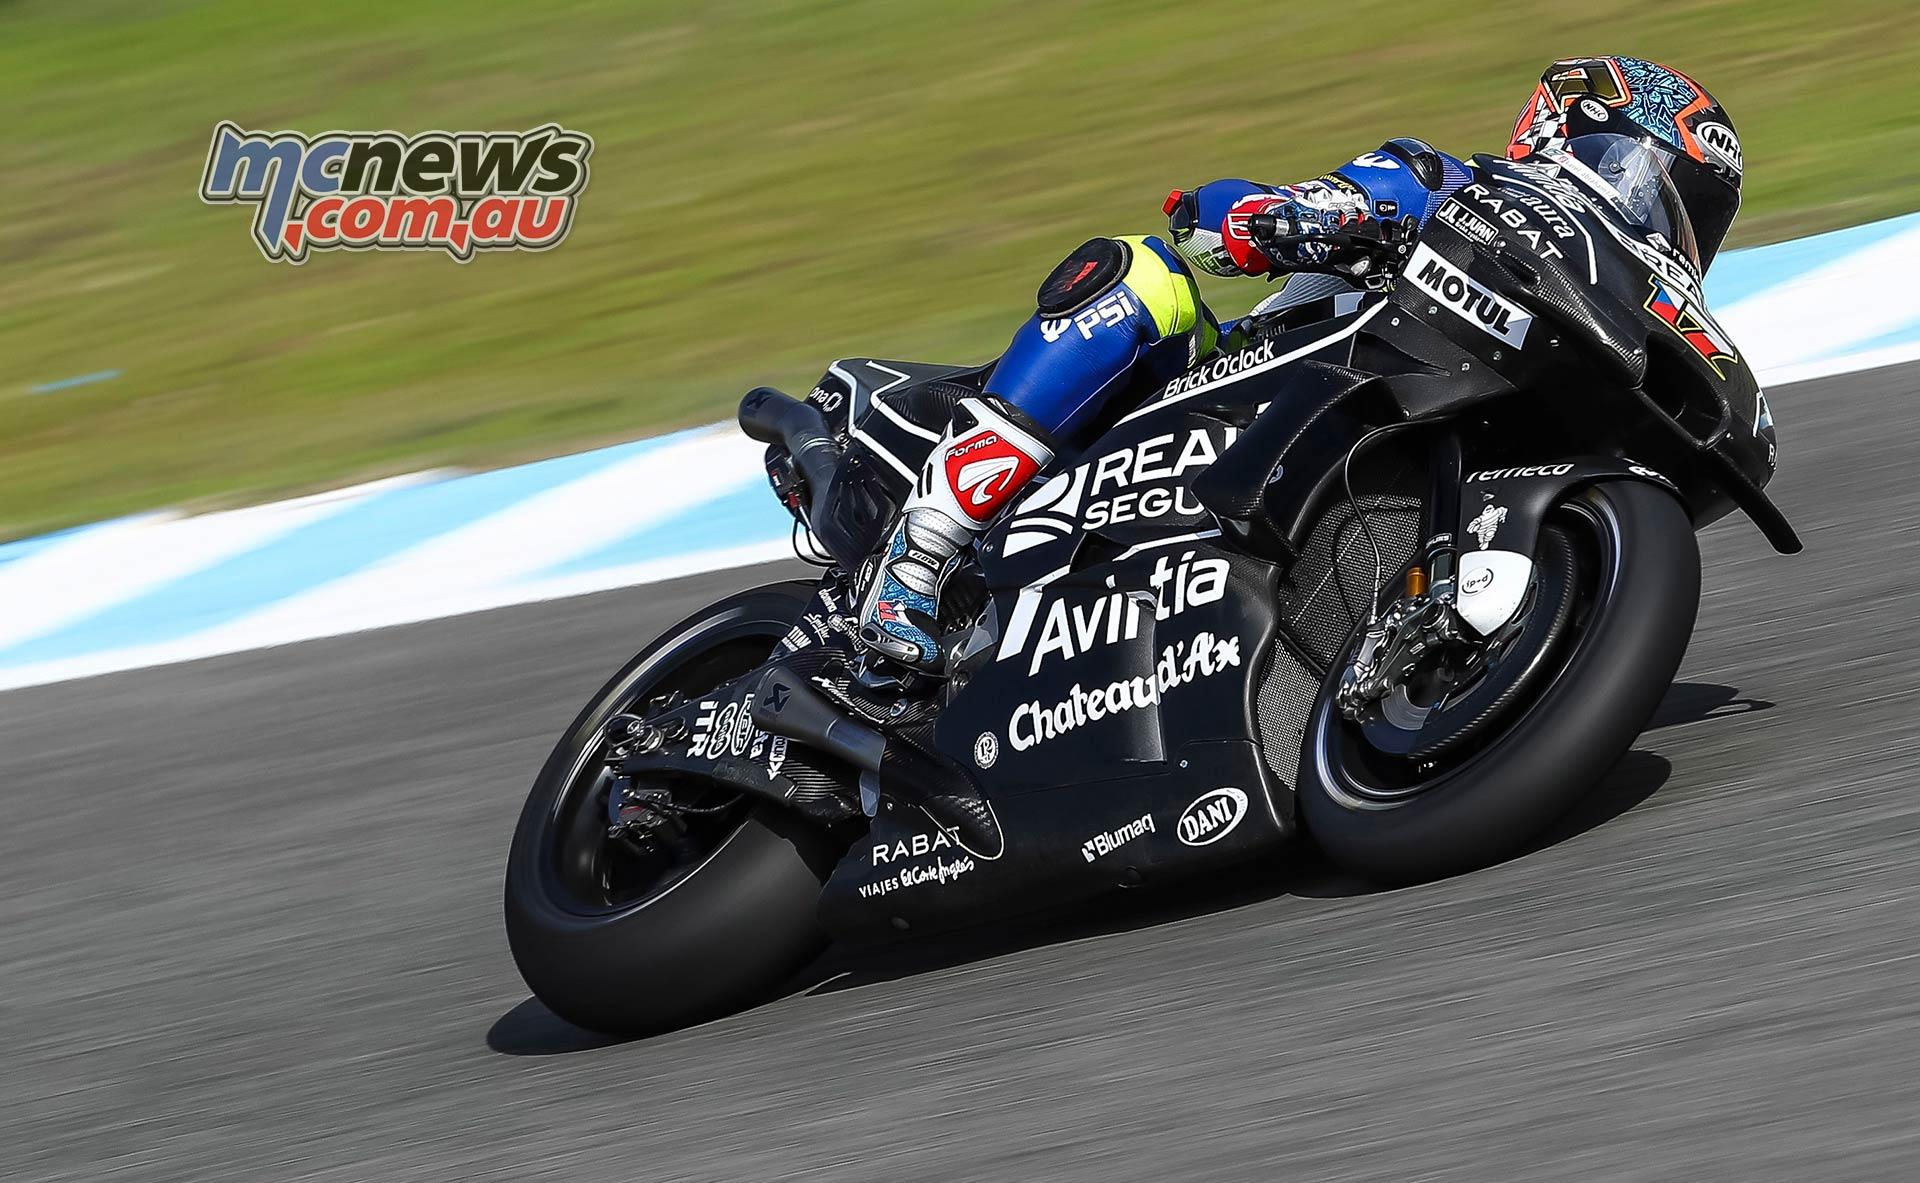 Takaaki Nakagami Tops Jerez 2019 Motogp Pre Season Test Mcnews Com Au